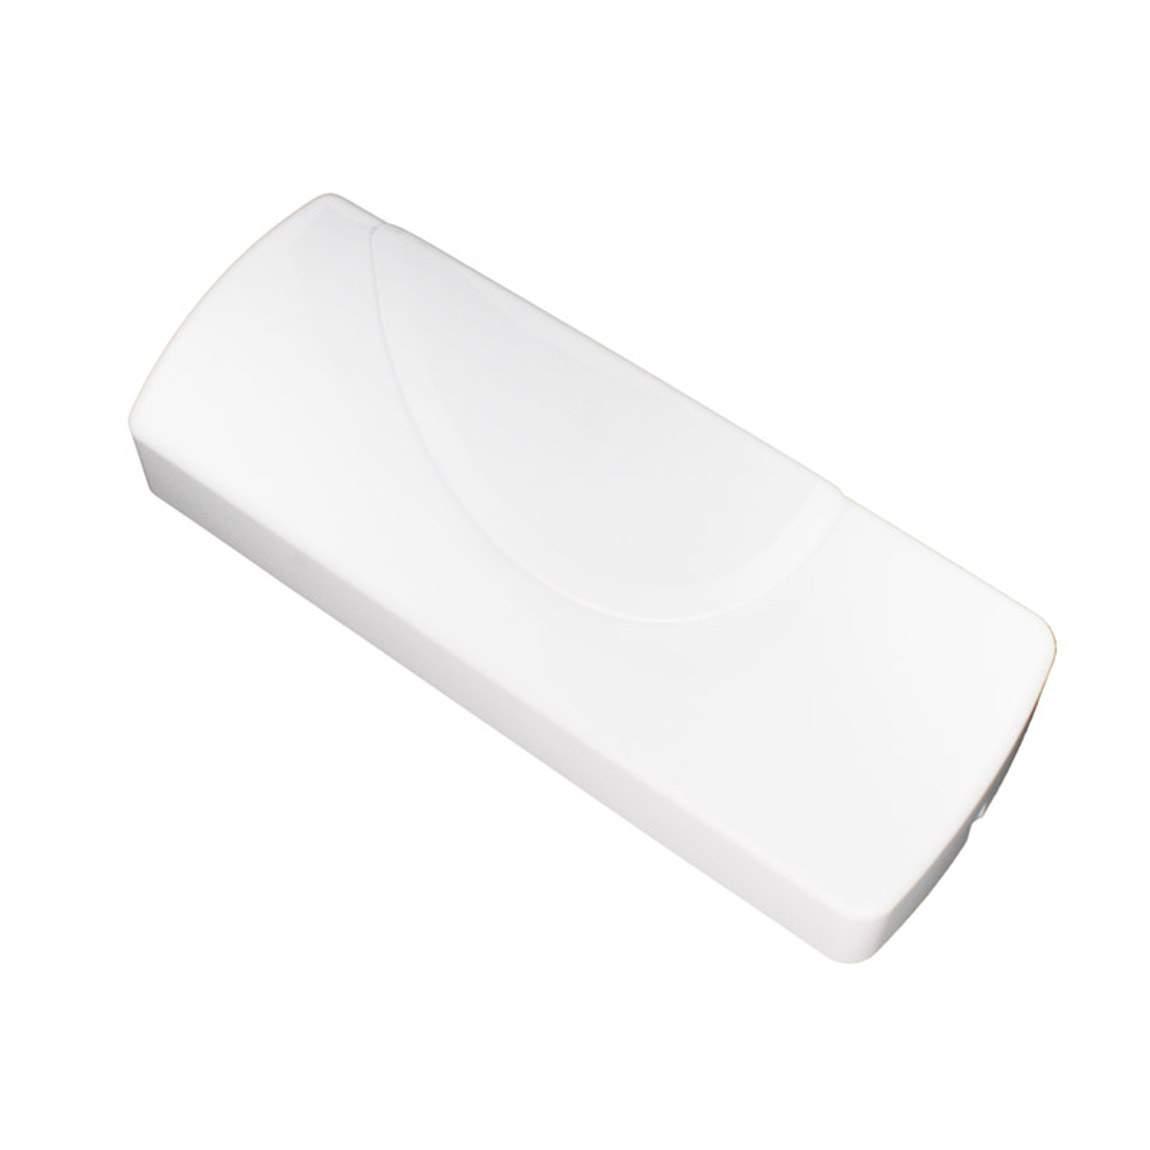 Lupusec Innensirene - Weiß